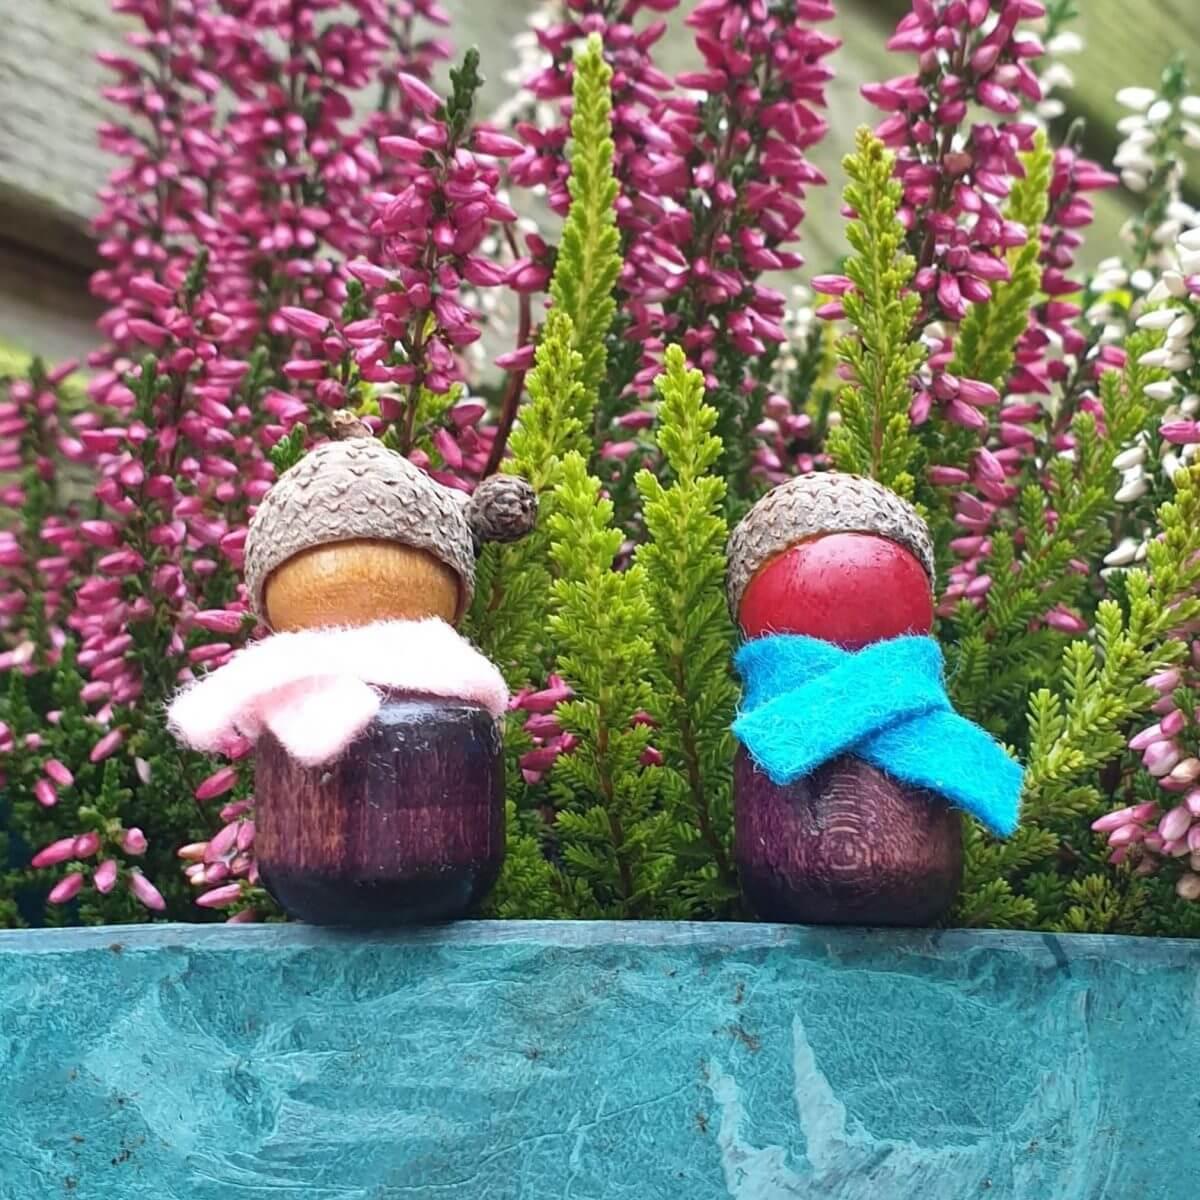 Herfst knutselen: poppetjes van kralen en eikeltjes dopjes